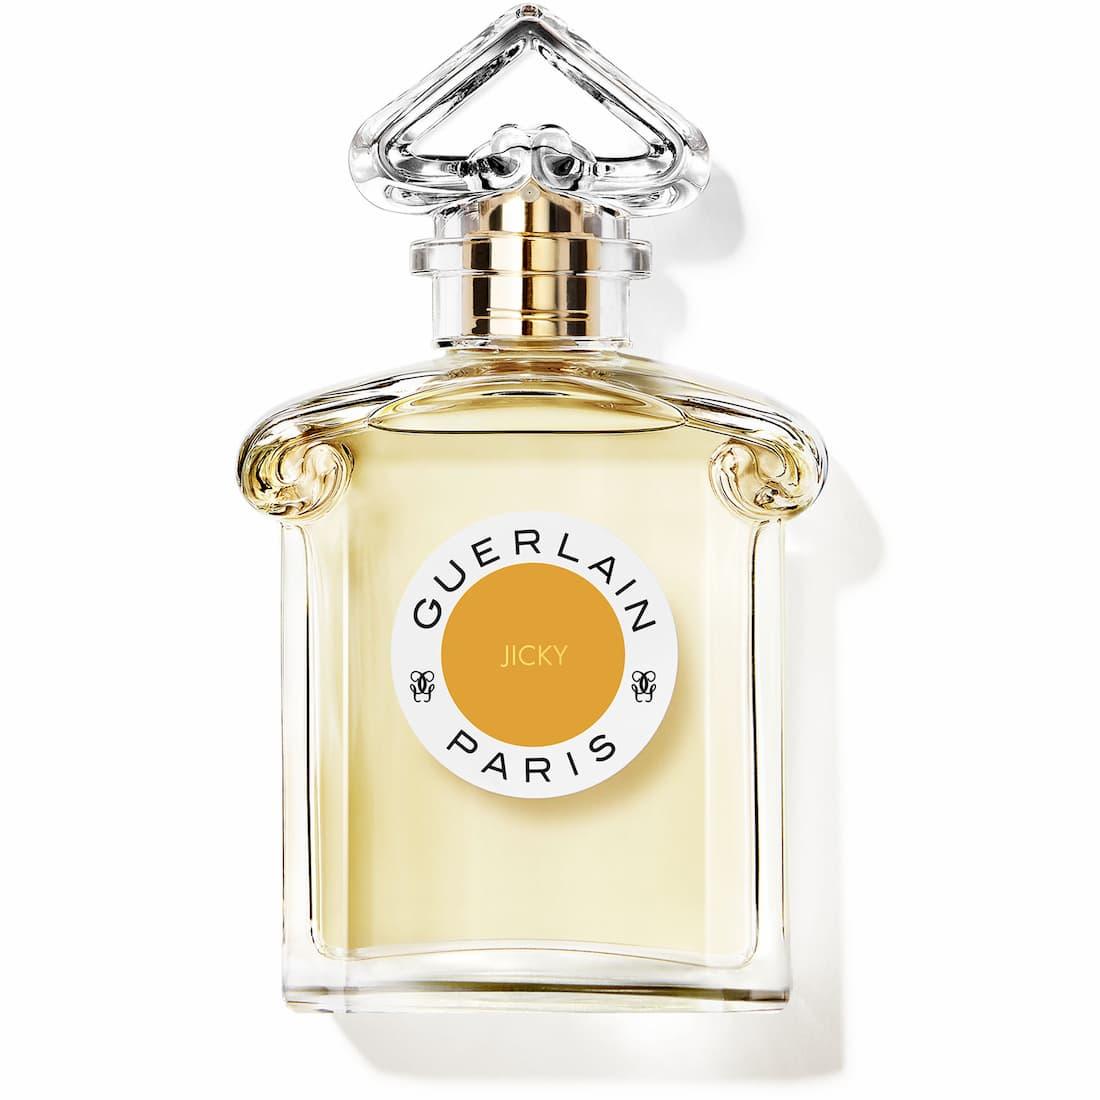 Jicky Eau de Parfum - GUERLAIN